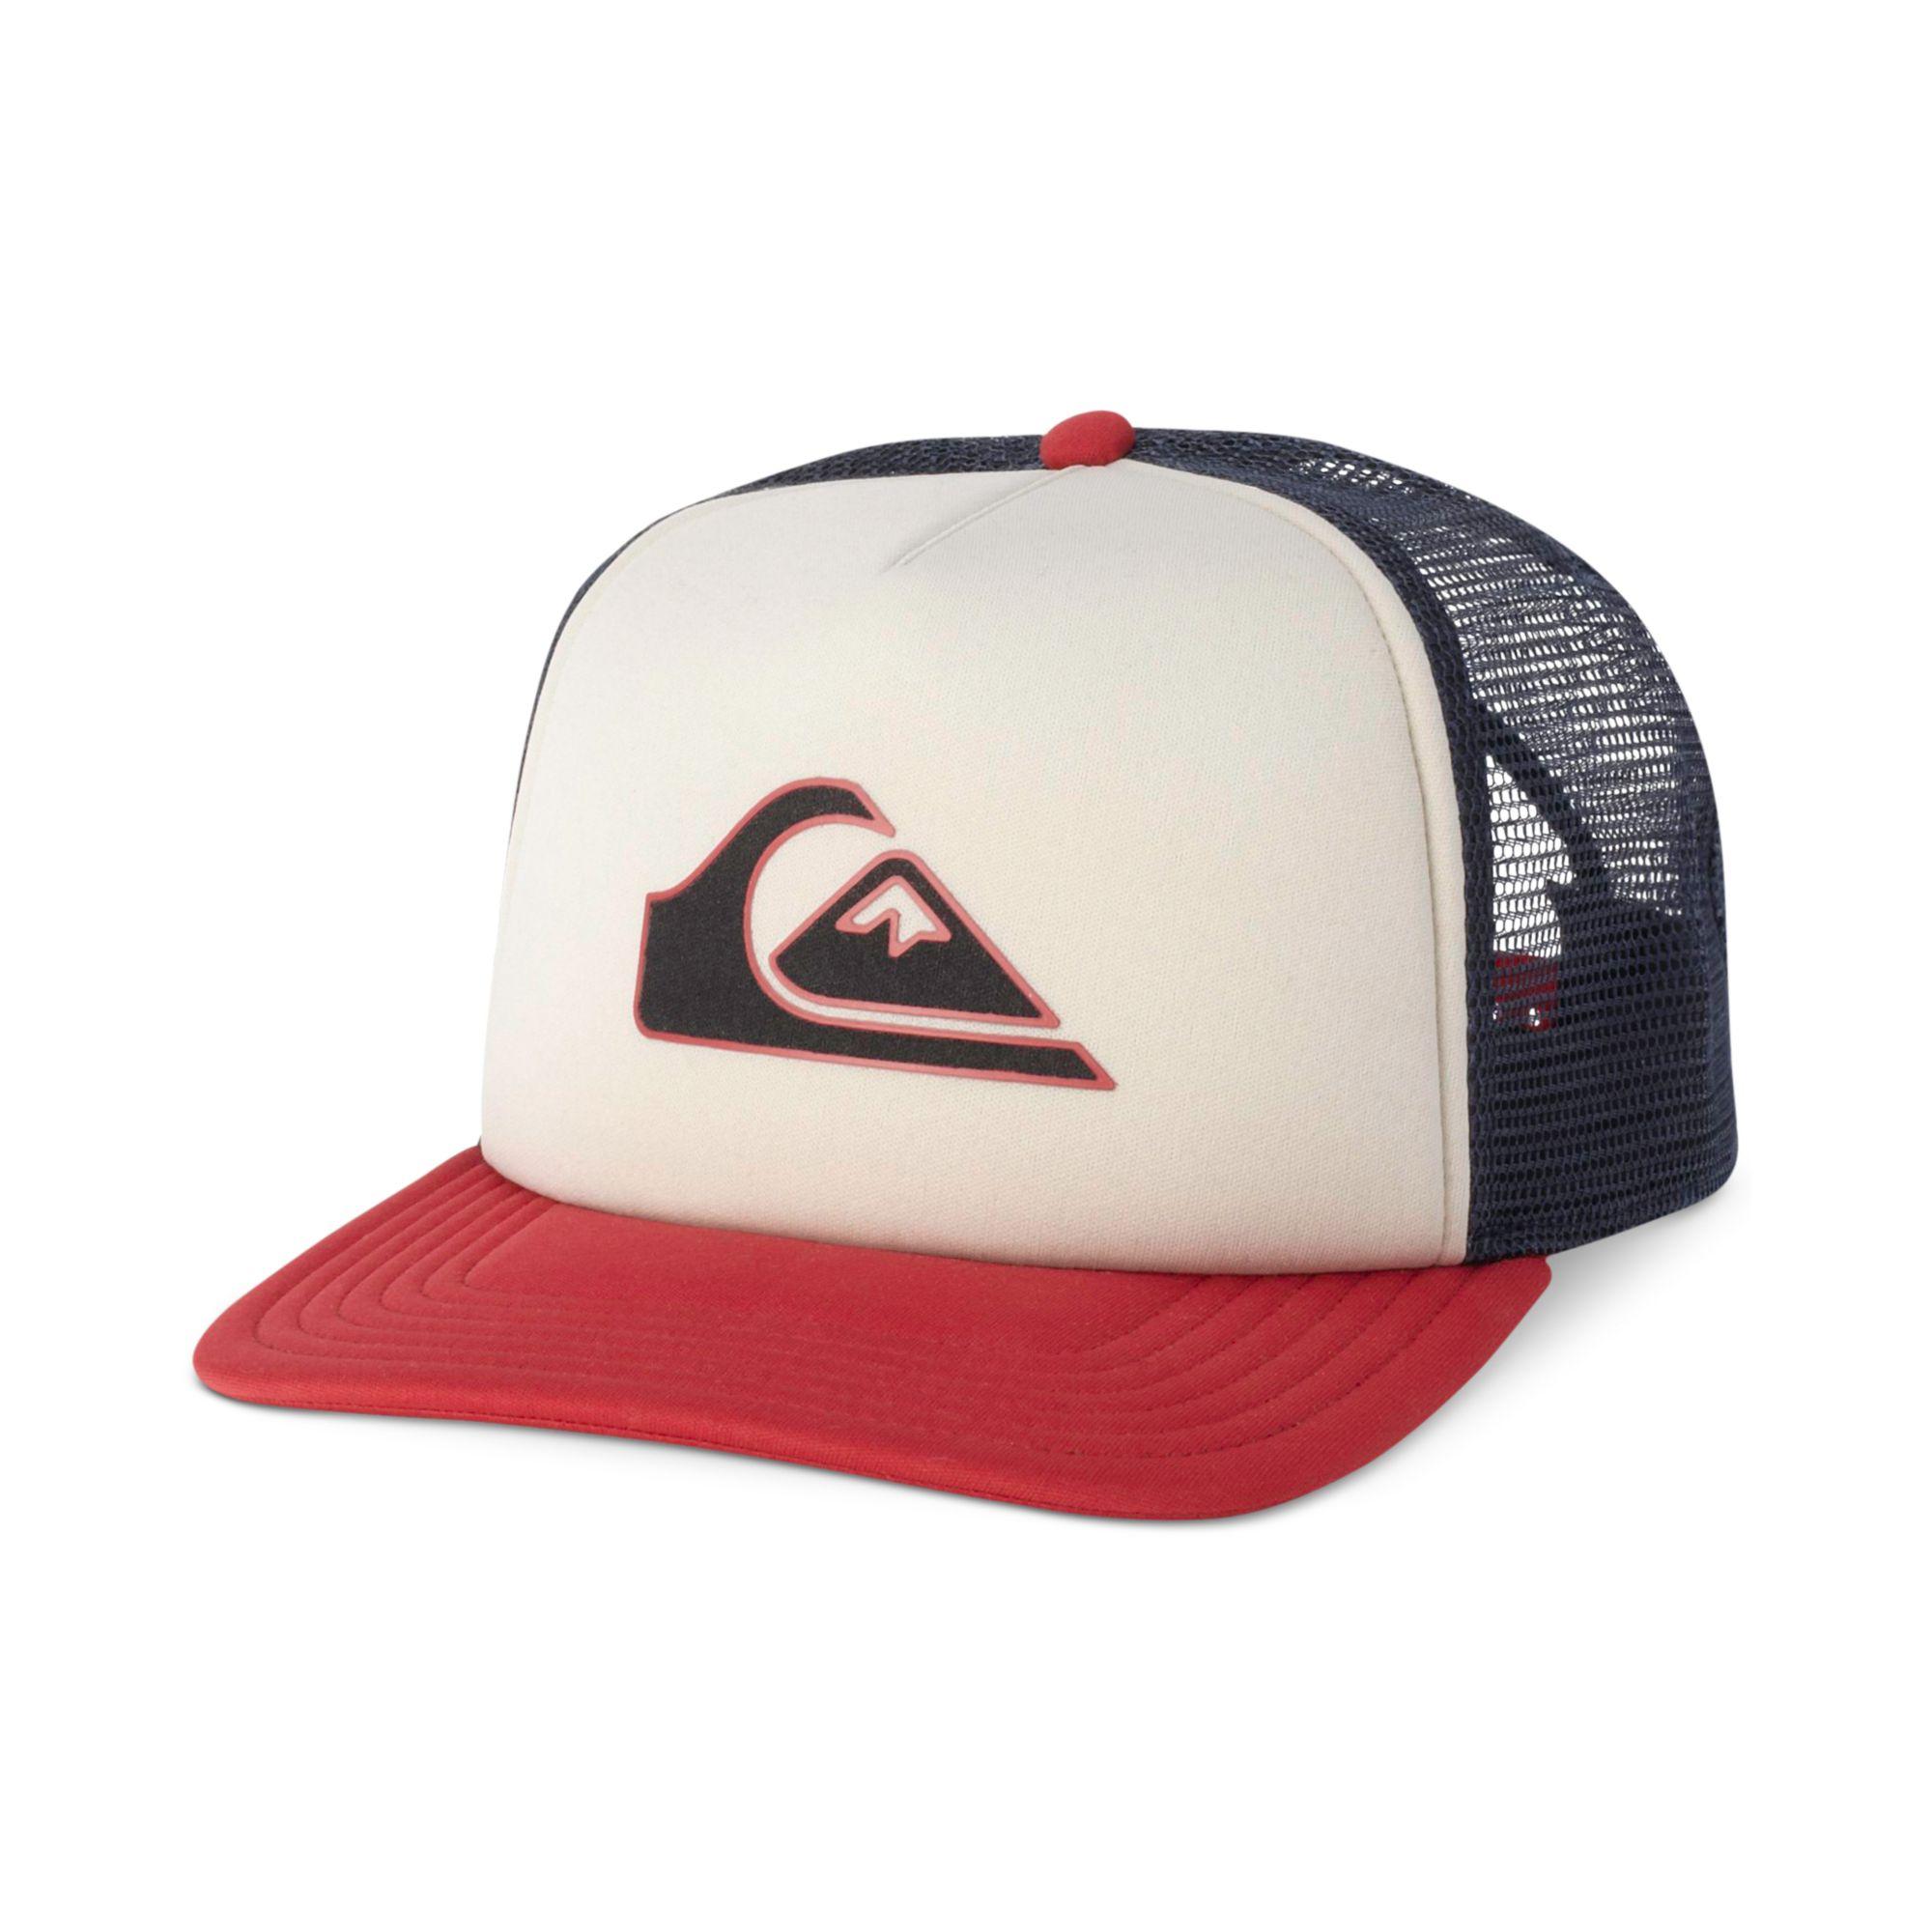 011055c22f1 netherlands greece lyst quiksilver threve mesh trucker hat in white for men  c96db d47db df03a 992b3